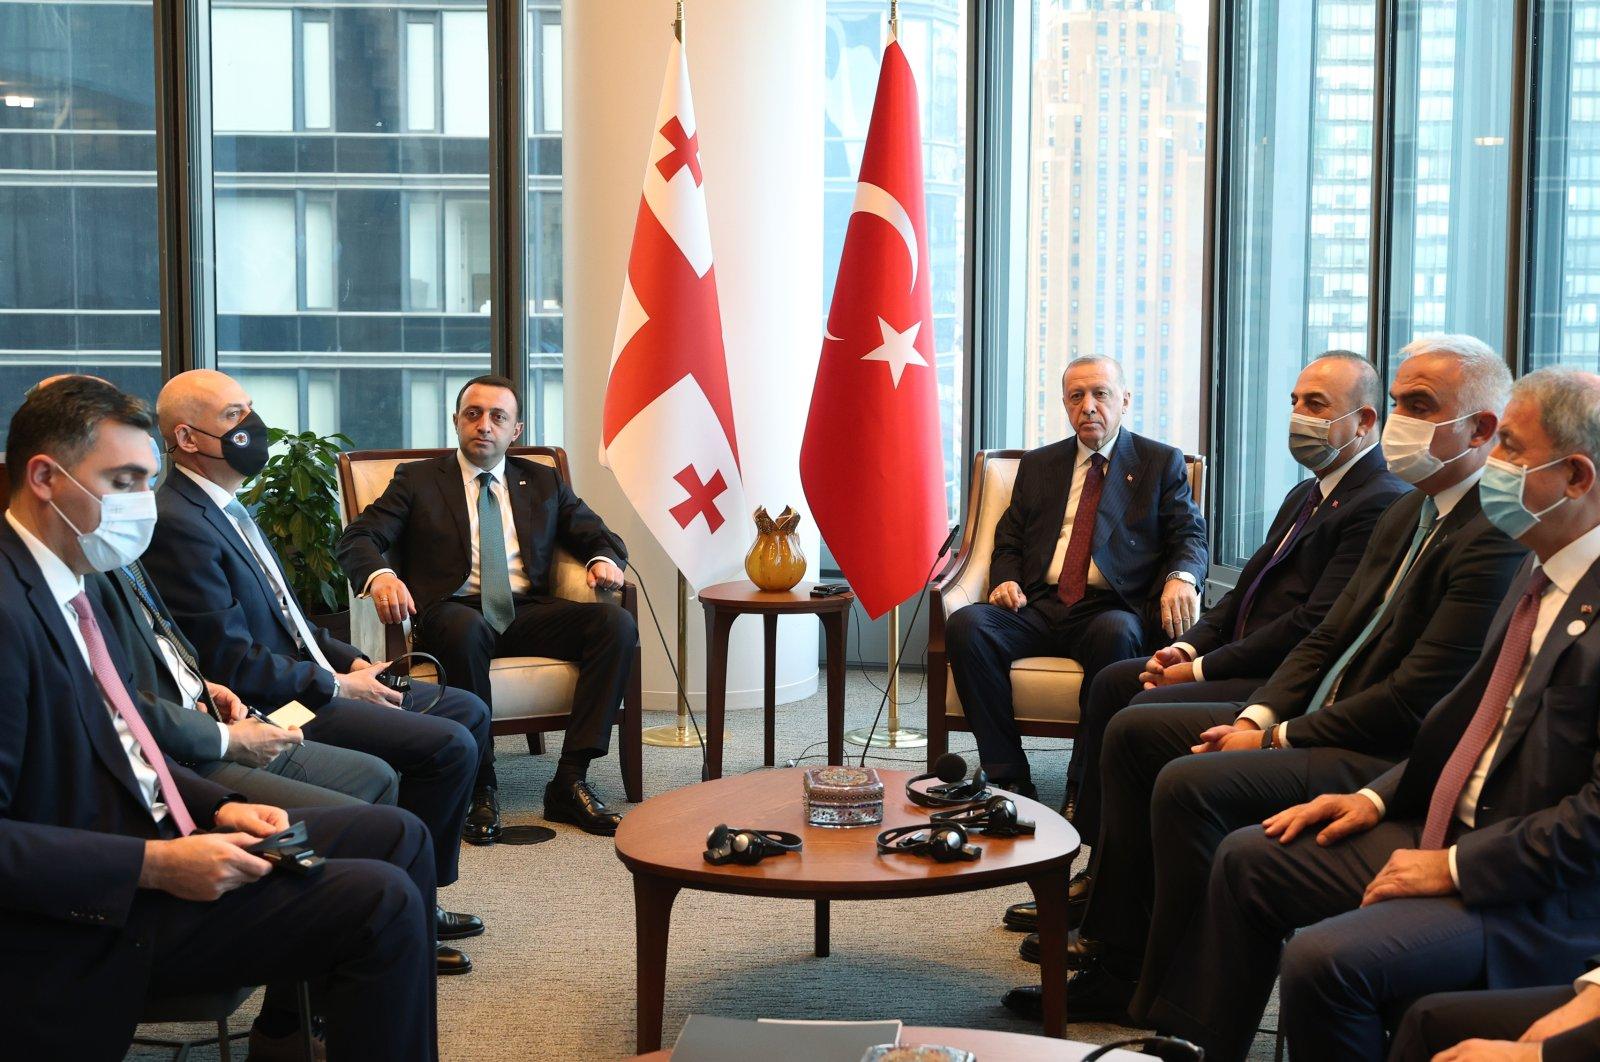 President Recep Tayyip Erdoğan holds a meetıng with Georgian PM Irakli Garibaşvili at Turkish House in New York City, Tuesday, Sept. 21, 2021. (AA Photo)